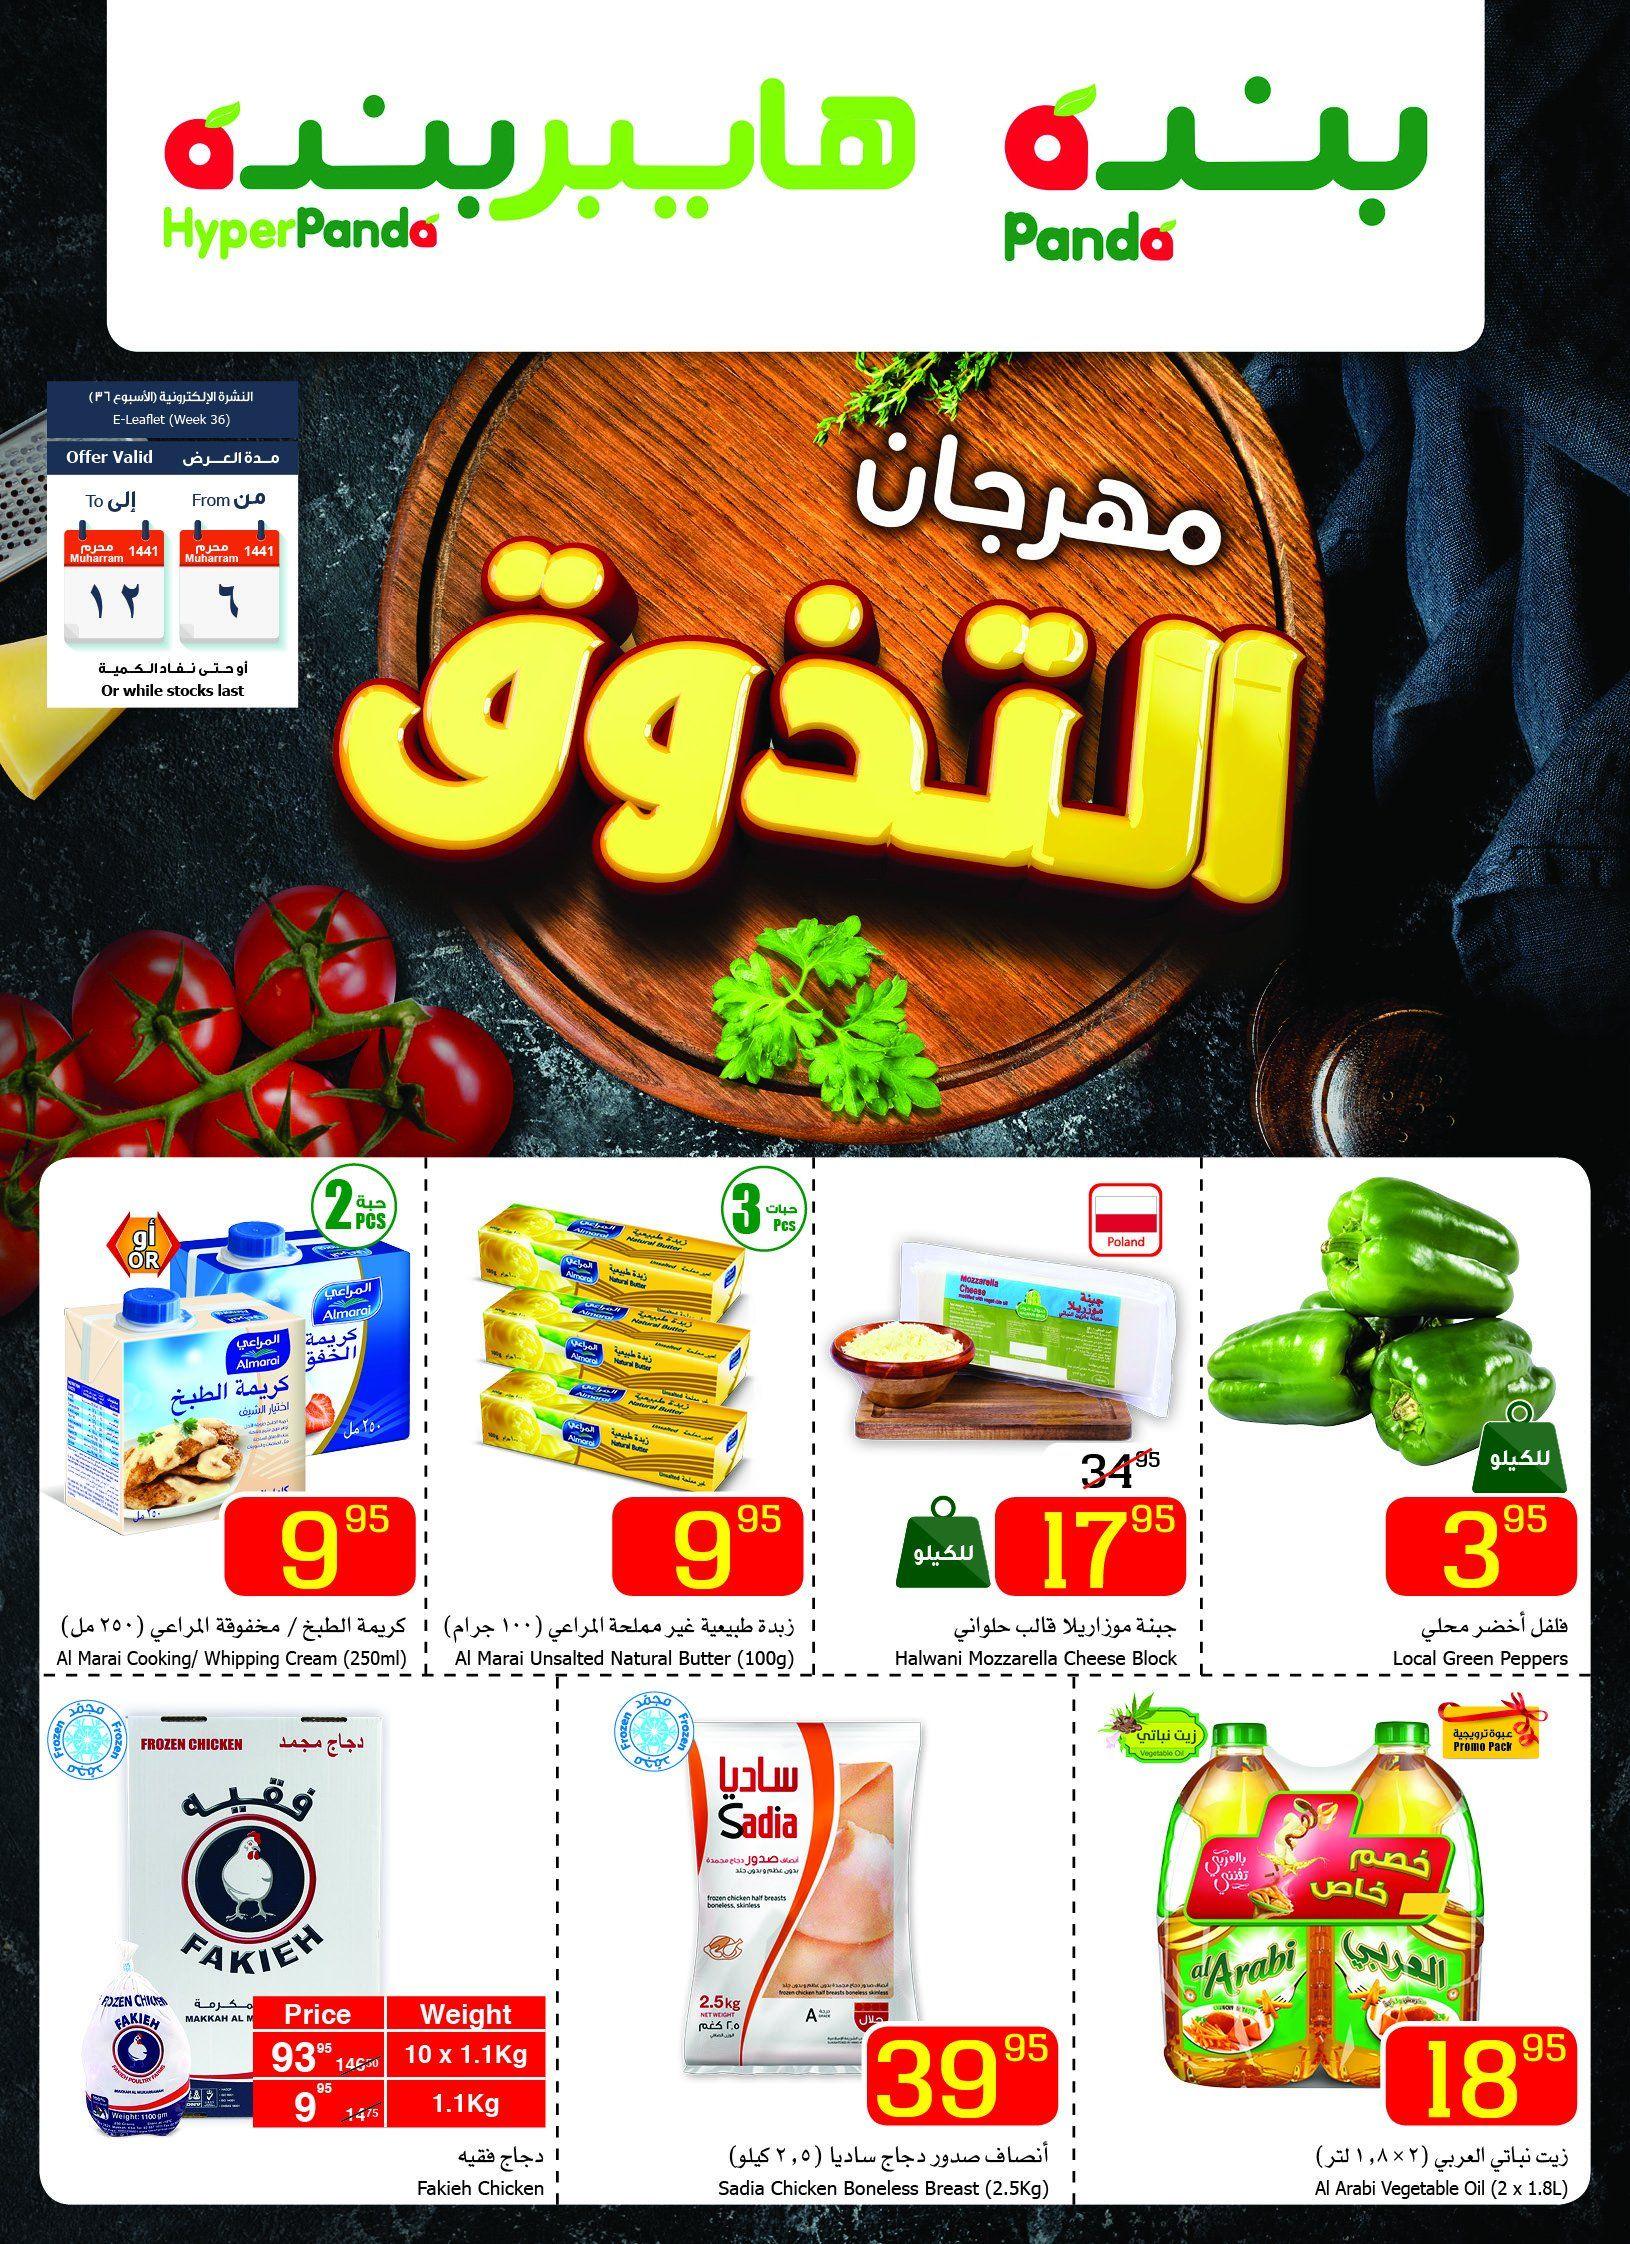 Pin By Soouq Sudia On عروض هايبر بنده Snack Recipes Cooking Food